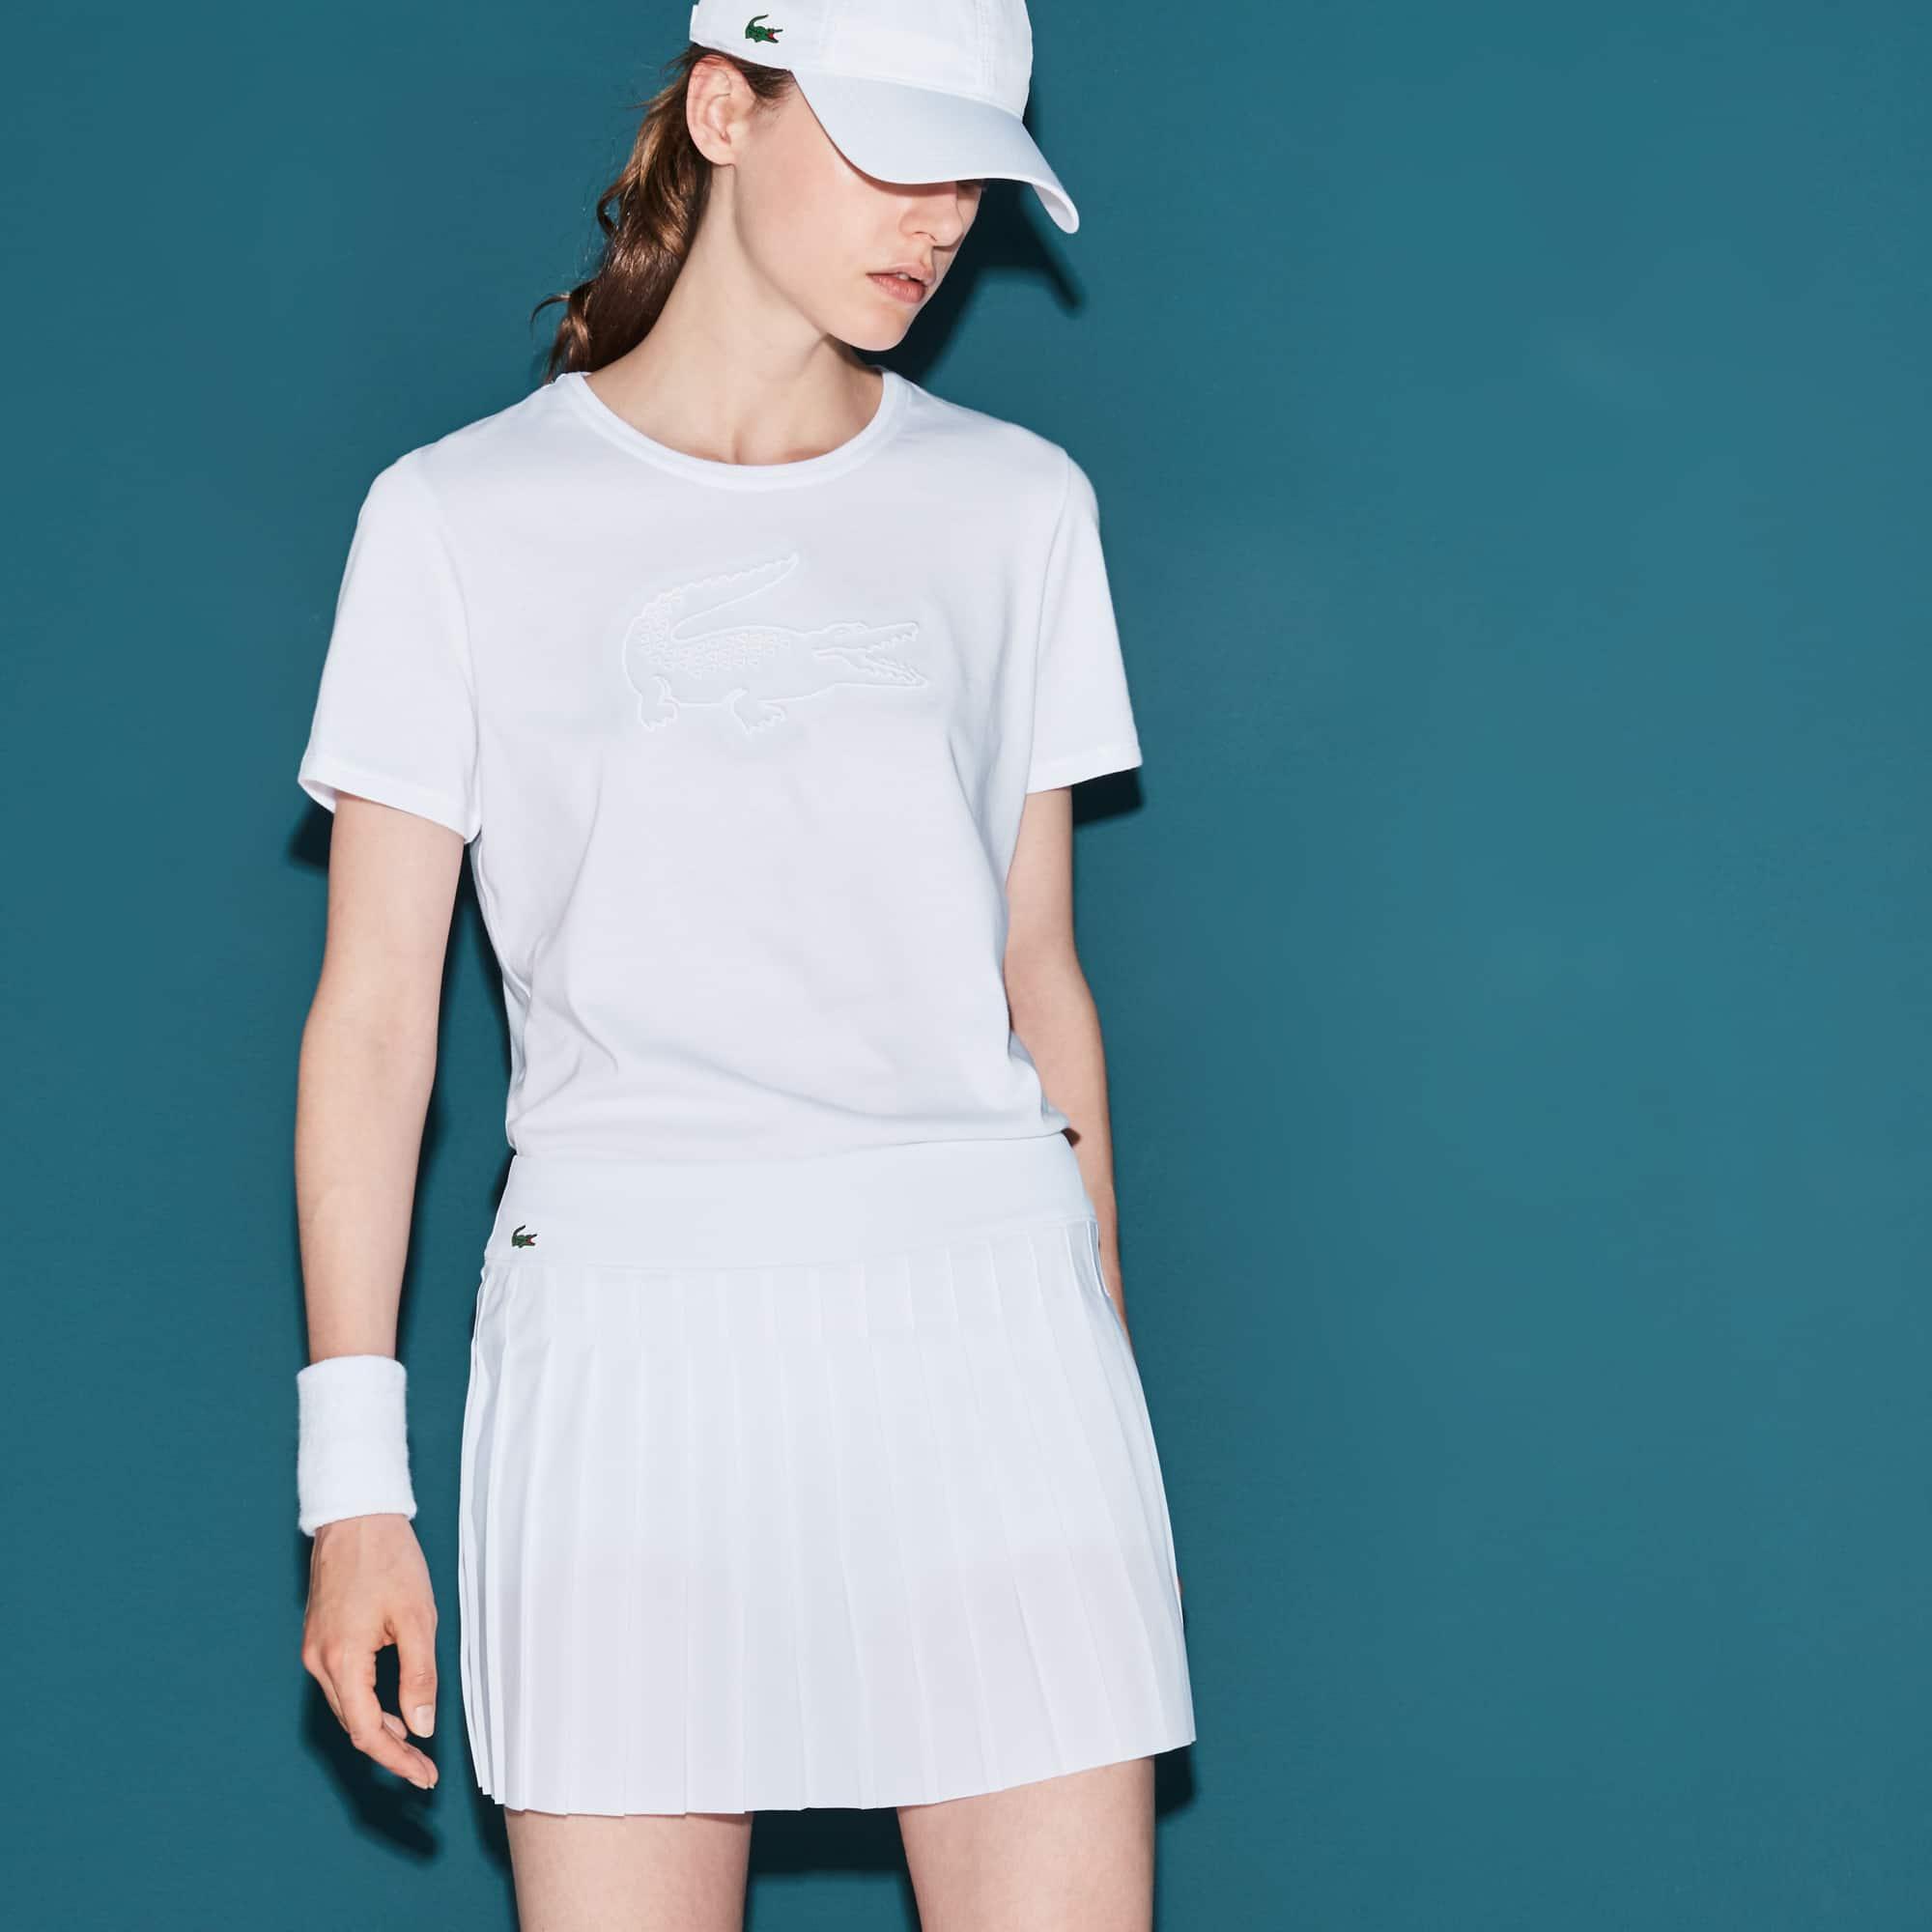 Women's Lacoste SPORT Tennis Croc Embroidery Tech Jersey T-shirt